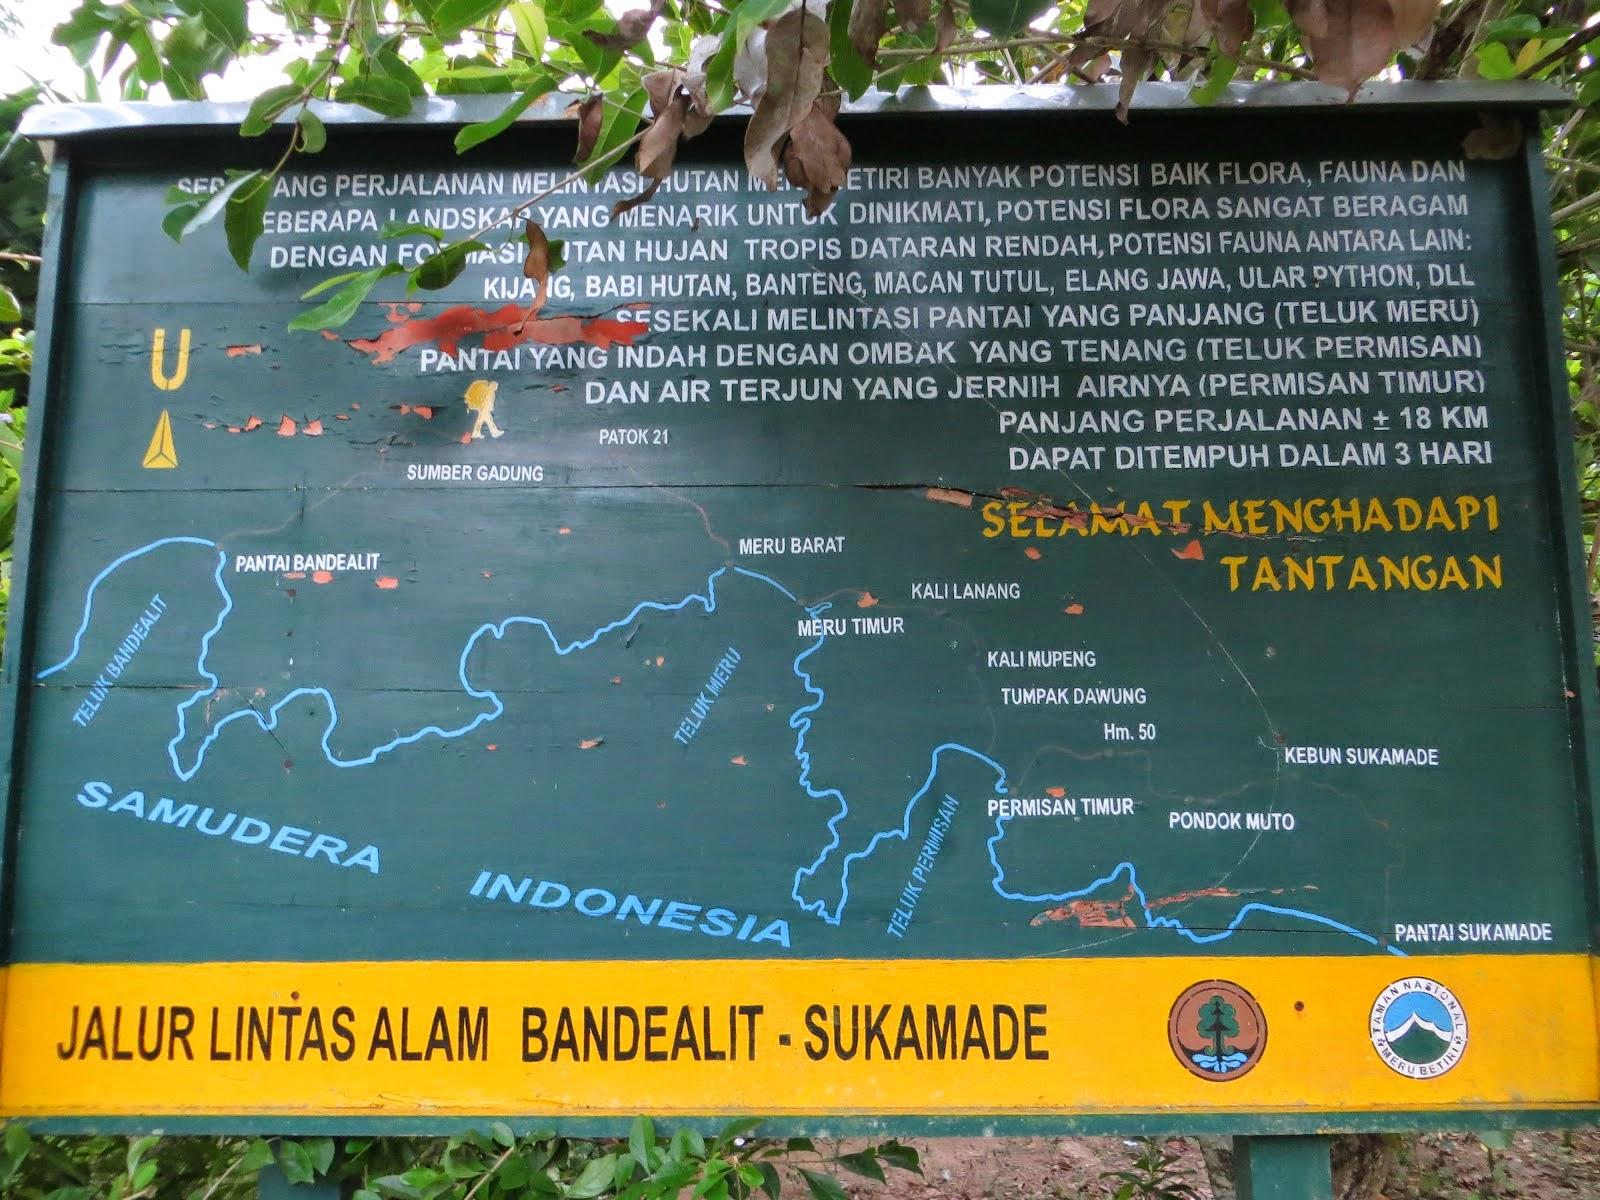 Taman Nasional Meru Betiri Surganya Flora Fauna Langka Jungle Tracking